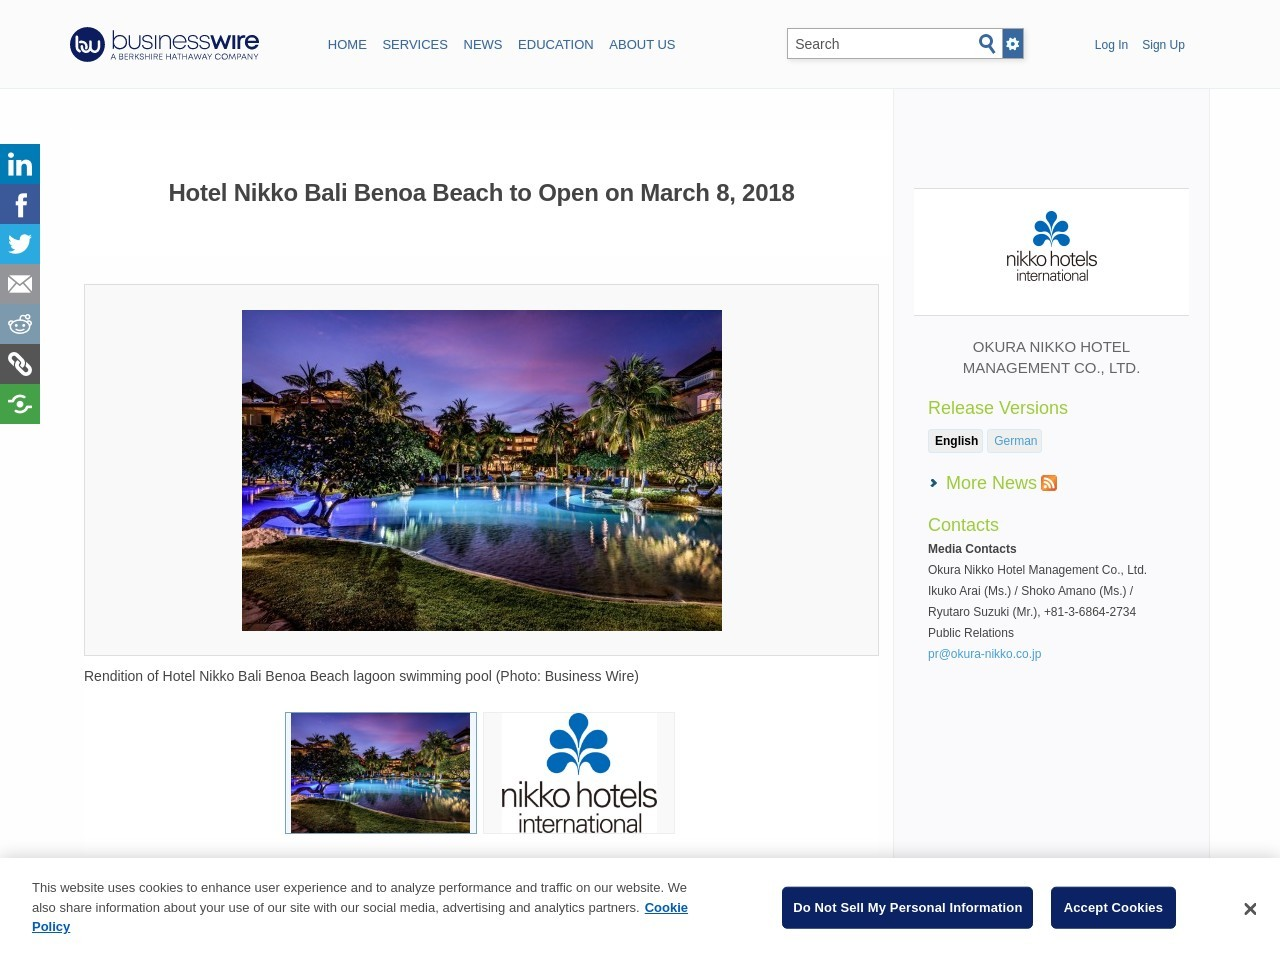 Hotel Nikko Bali Benoa Beach to Open on March eight, 2018